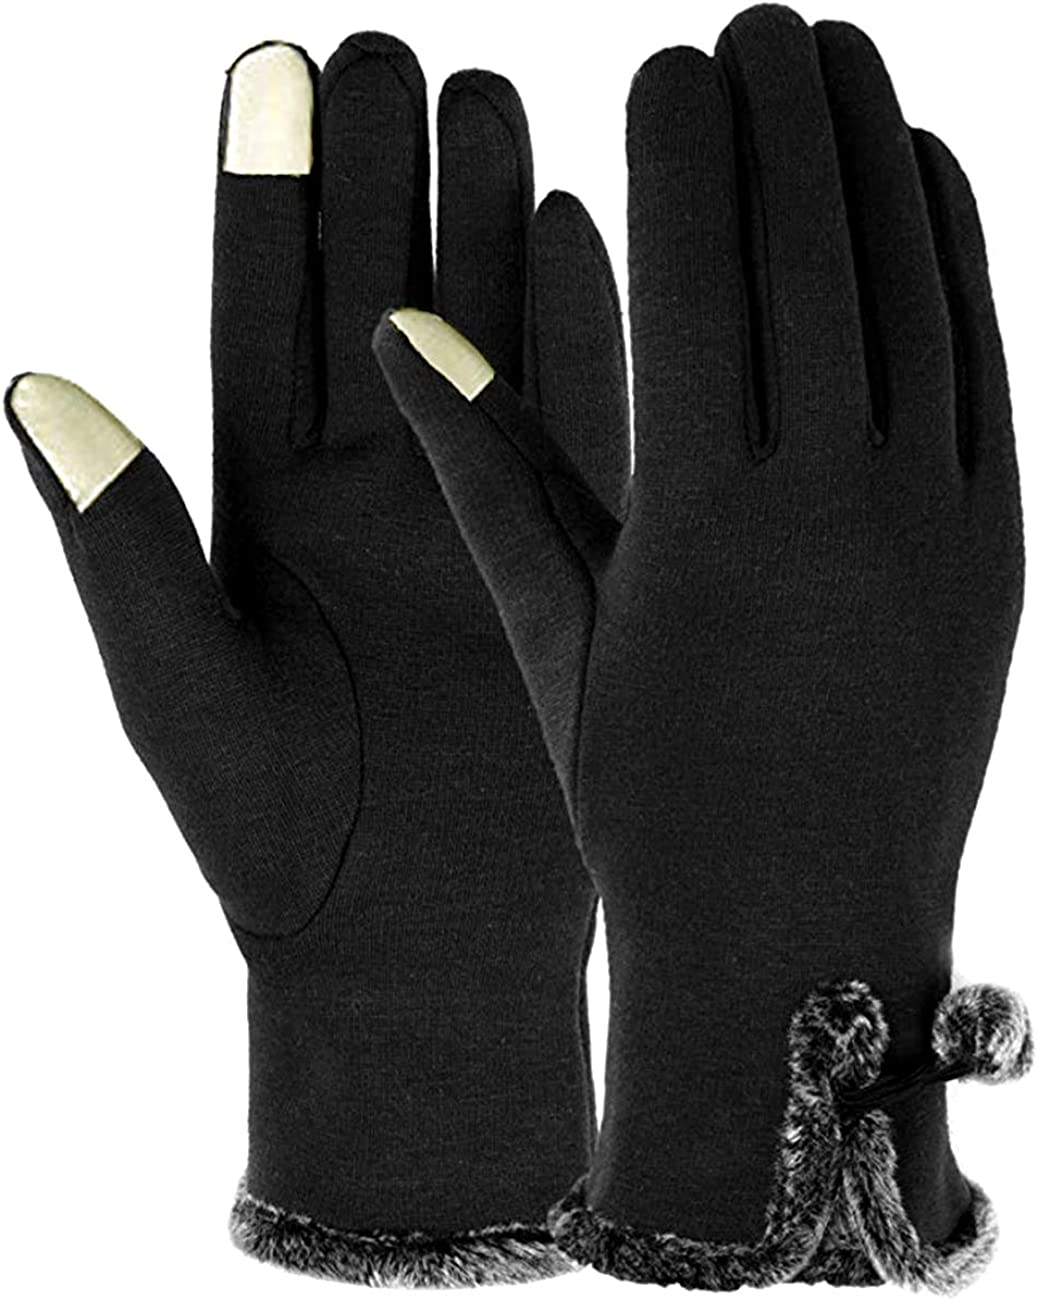 VANGETIMI Womens Winter Touch Screen Gloves Warm Fleece Lined Windproof Texting Gloves for Women Girls